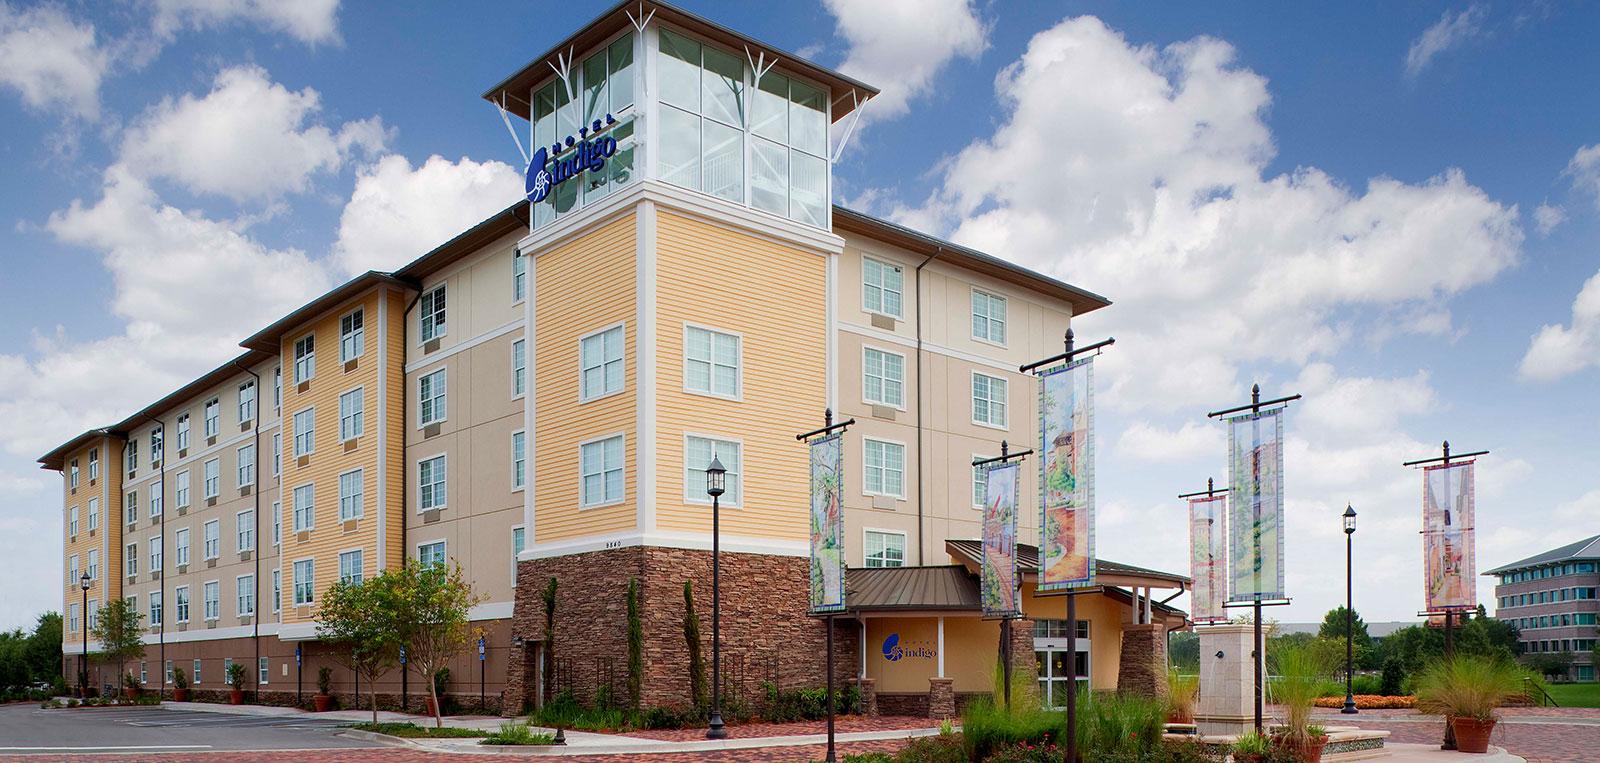 Jacksonville, Fl Hotel - Hotel Indigo Deerwood Park - Map Of Hotels In Jacksonville Florida